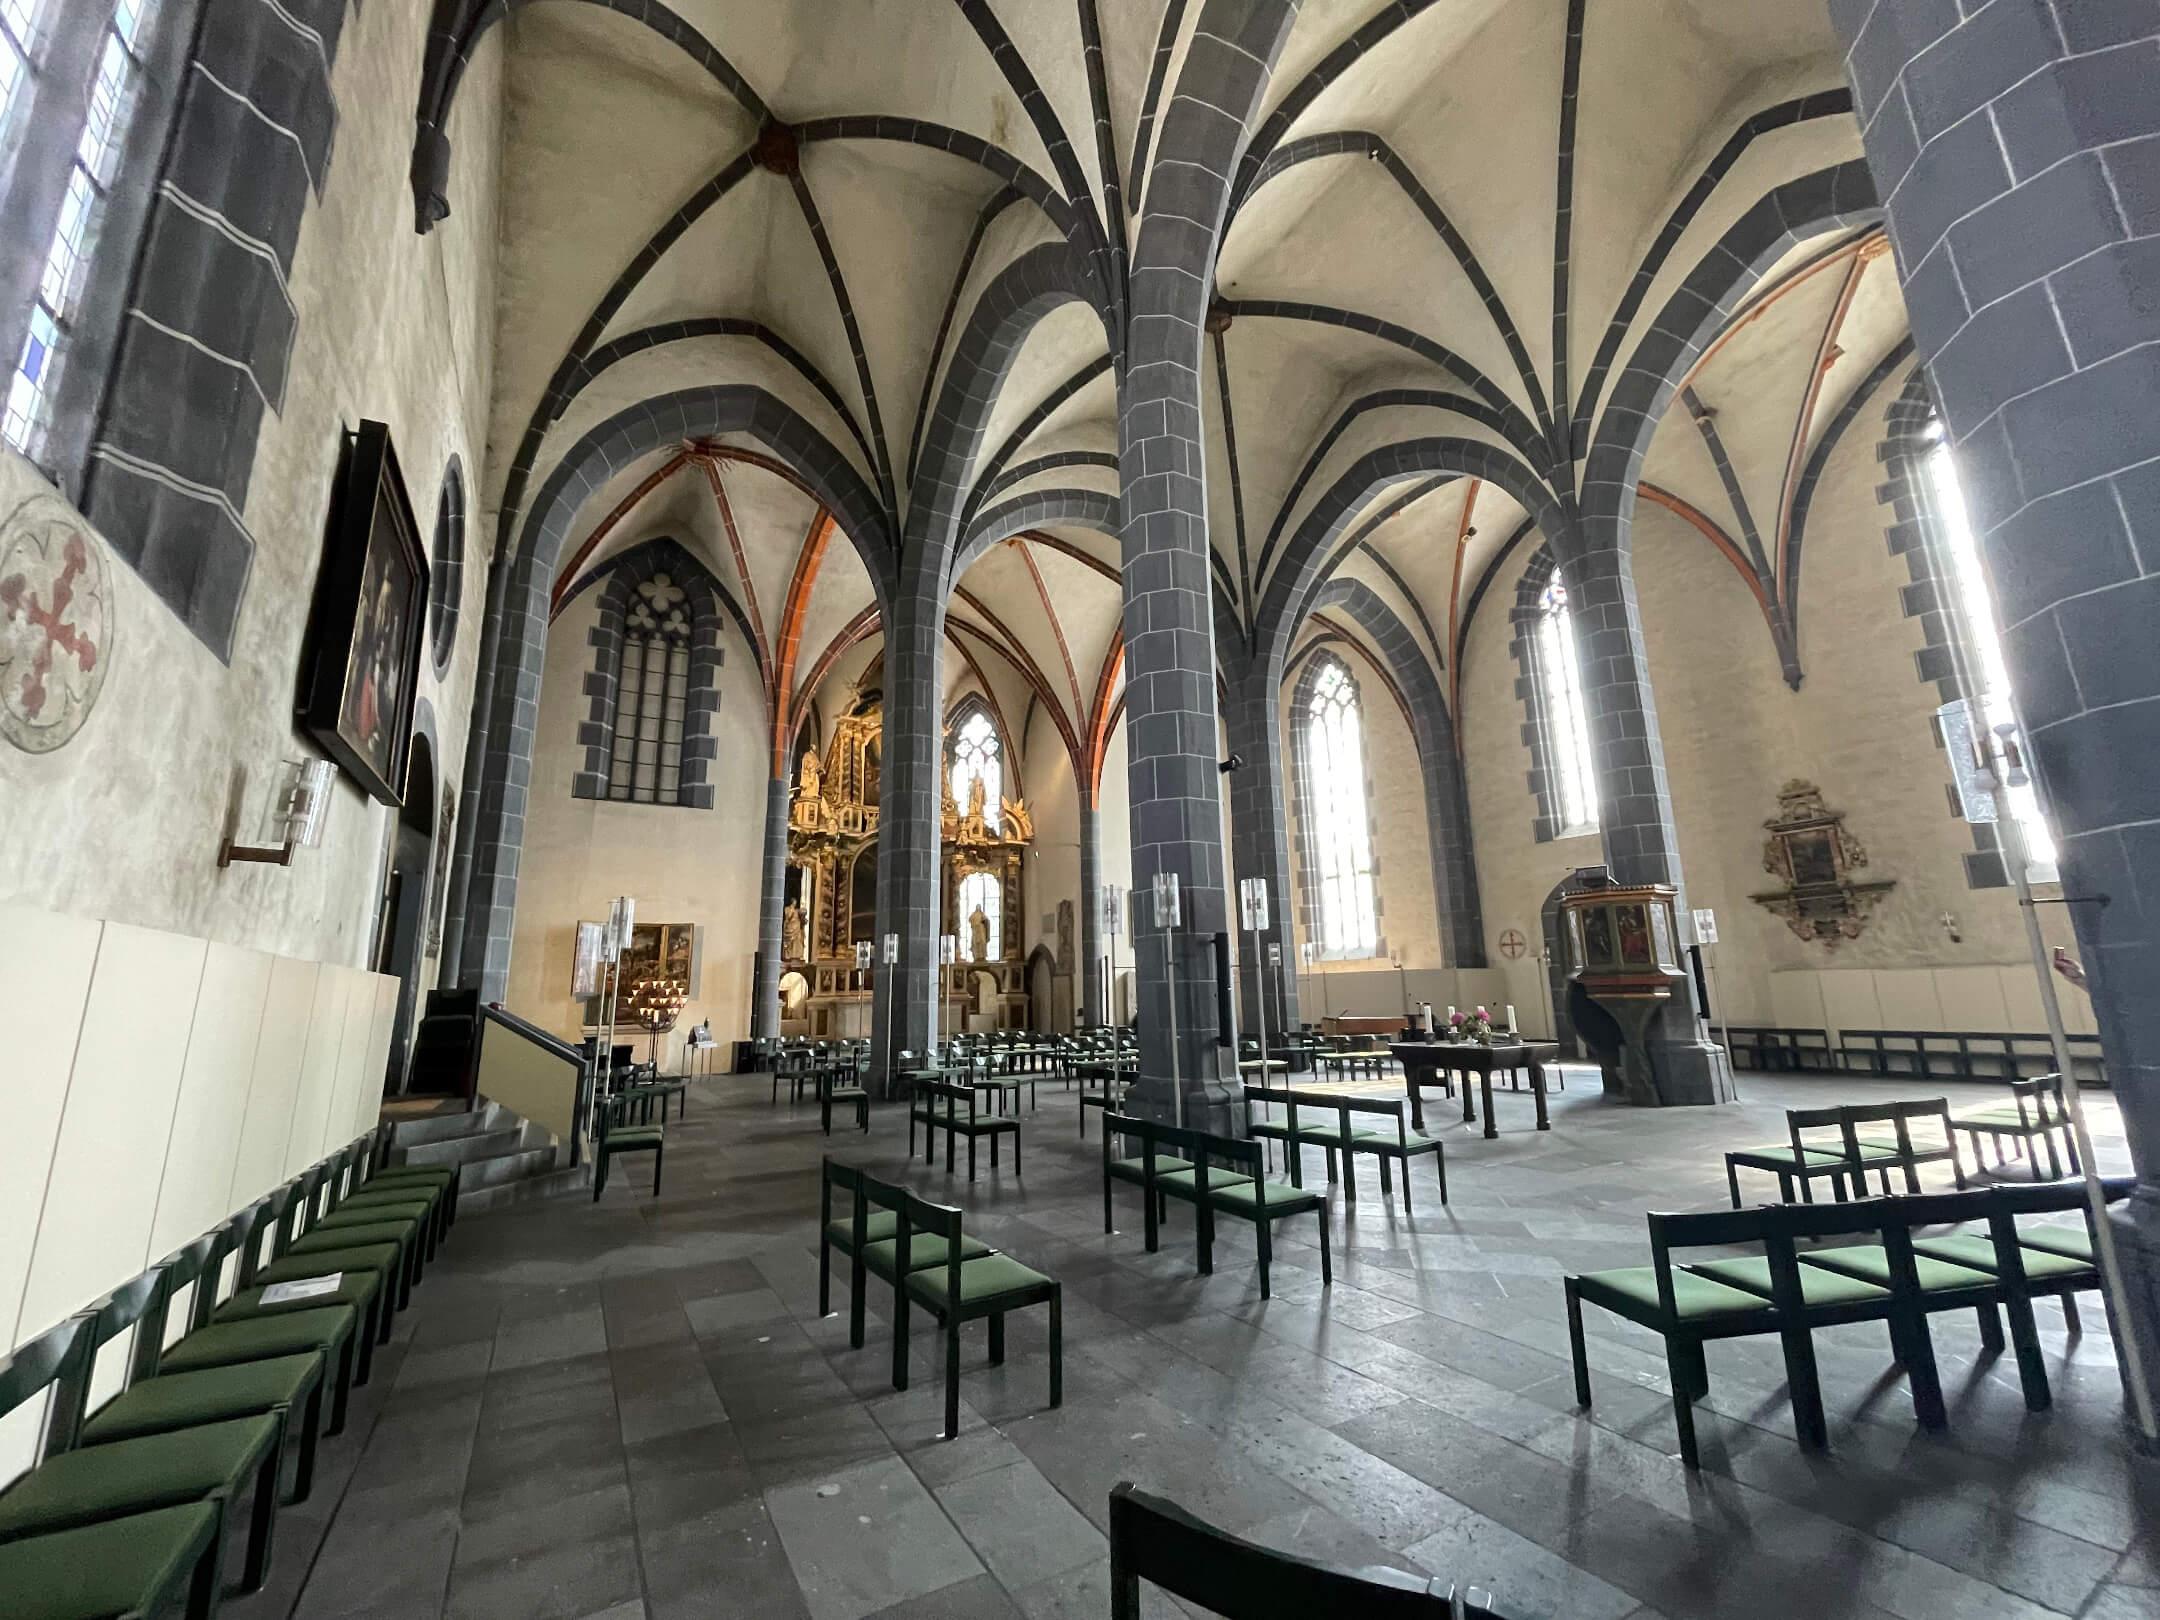 St. Blasius Kirche, innen